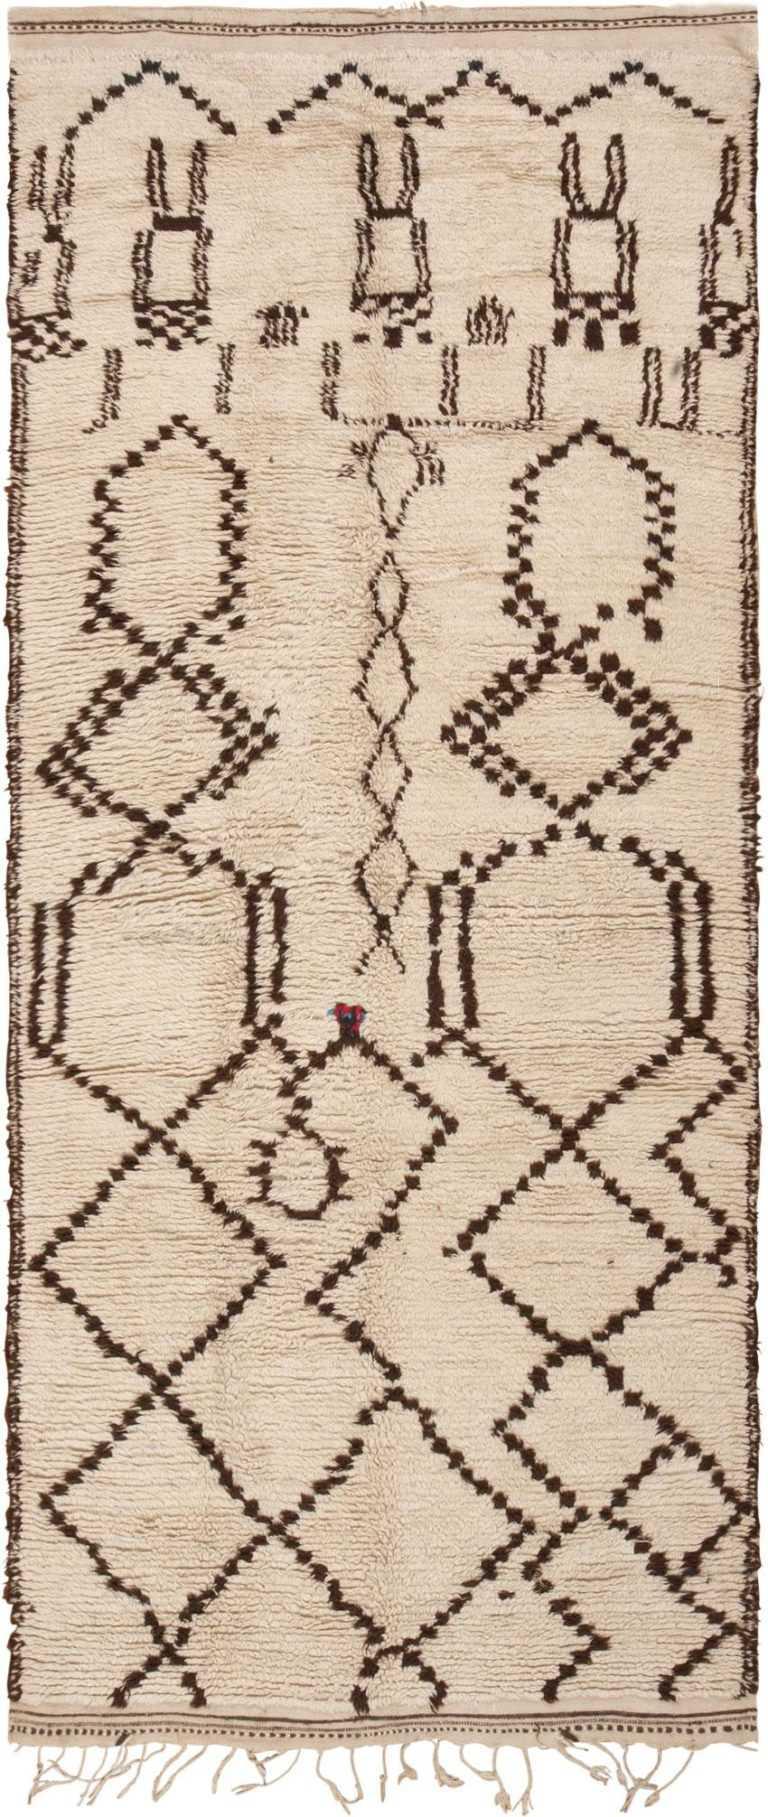 Vintage Moroccan Rug 46039 Detail/Large View